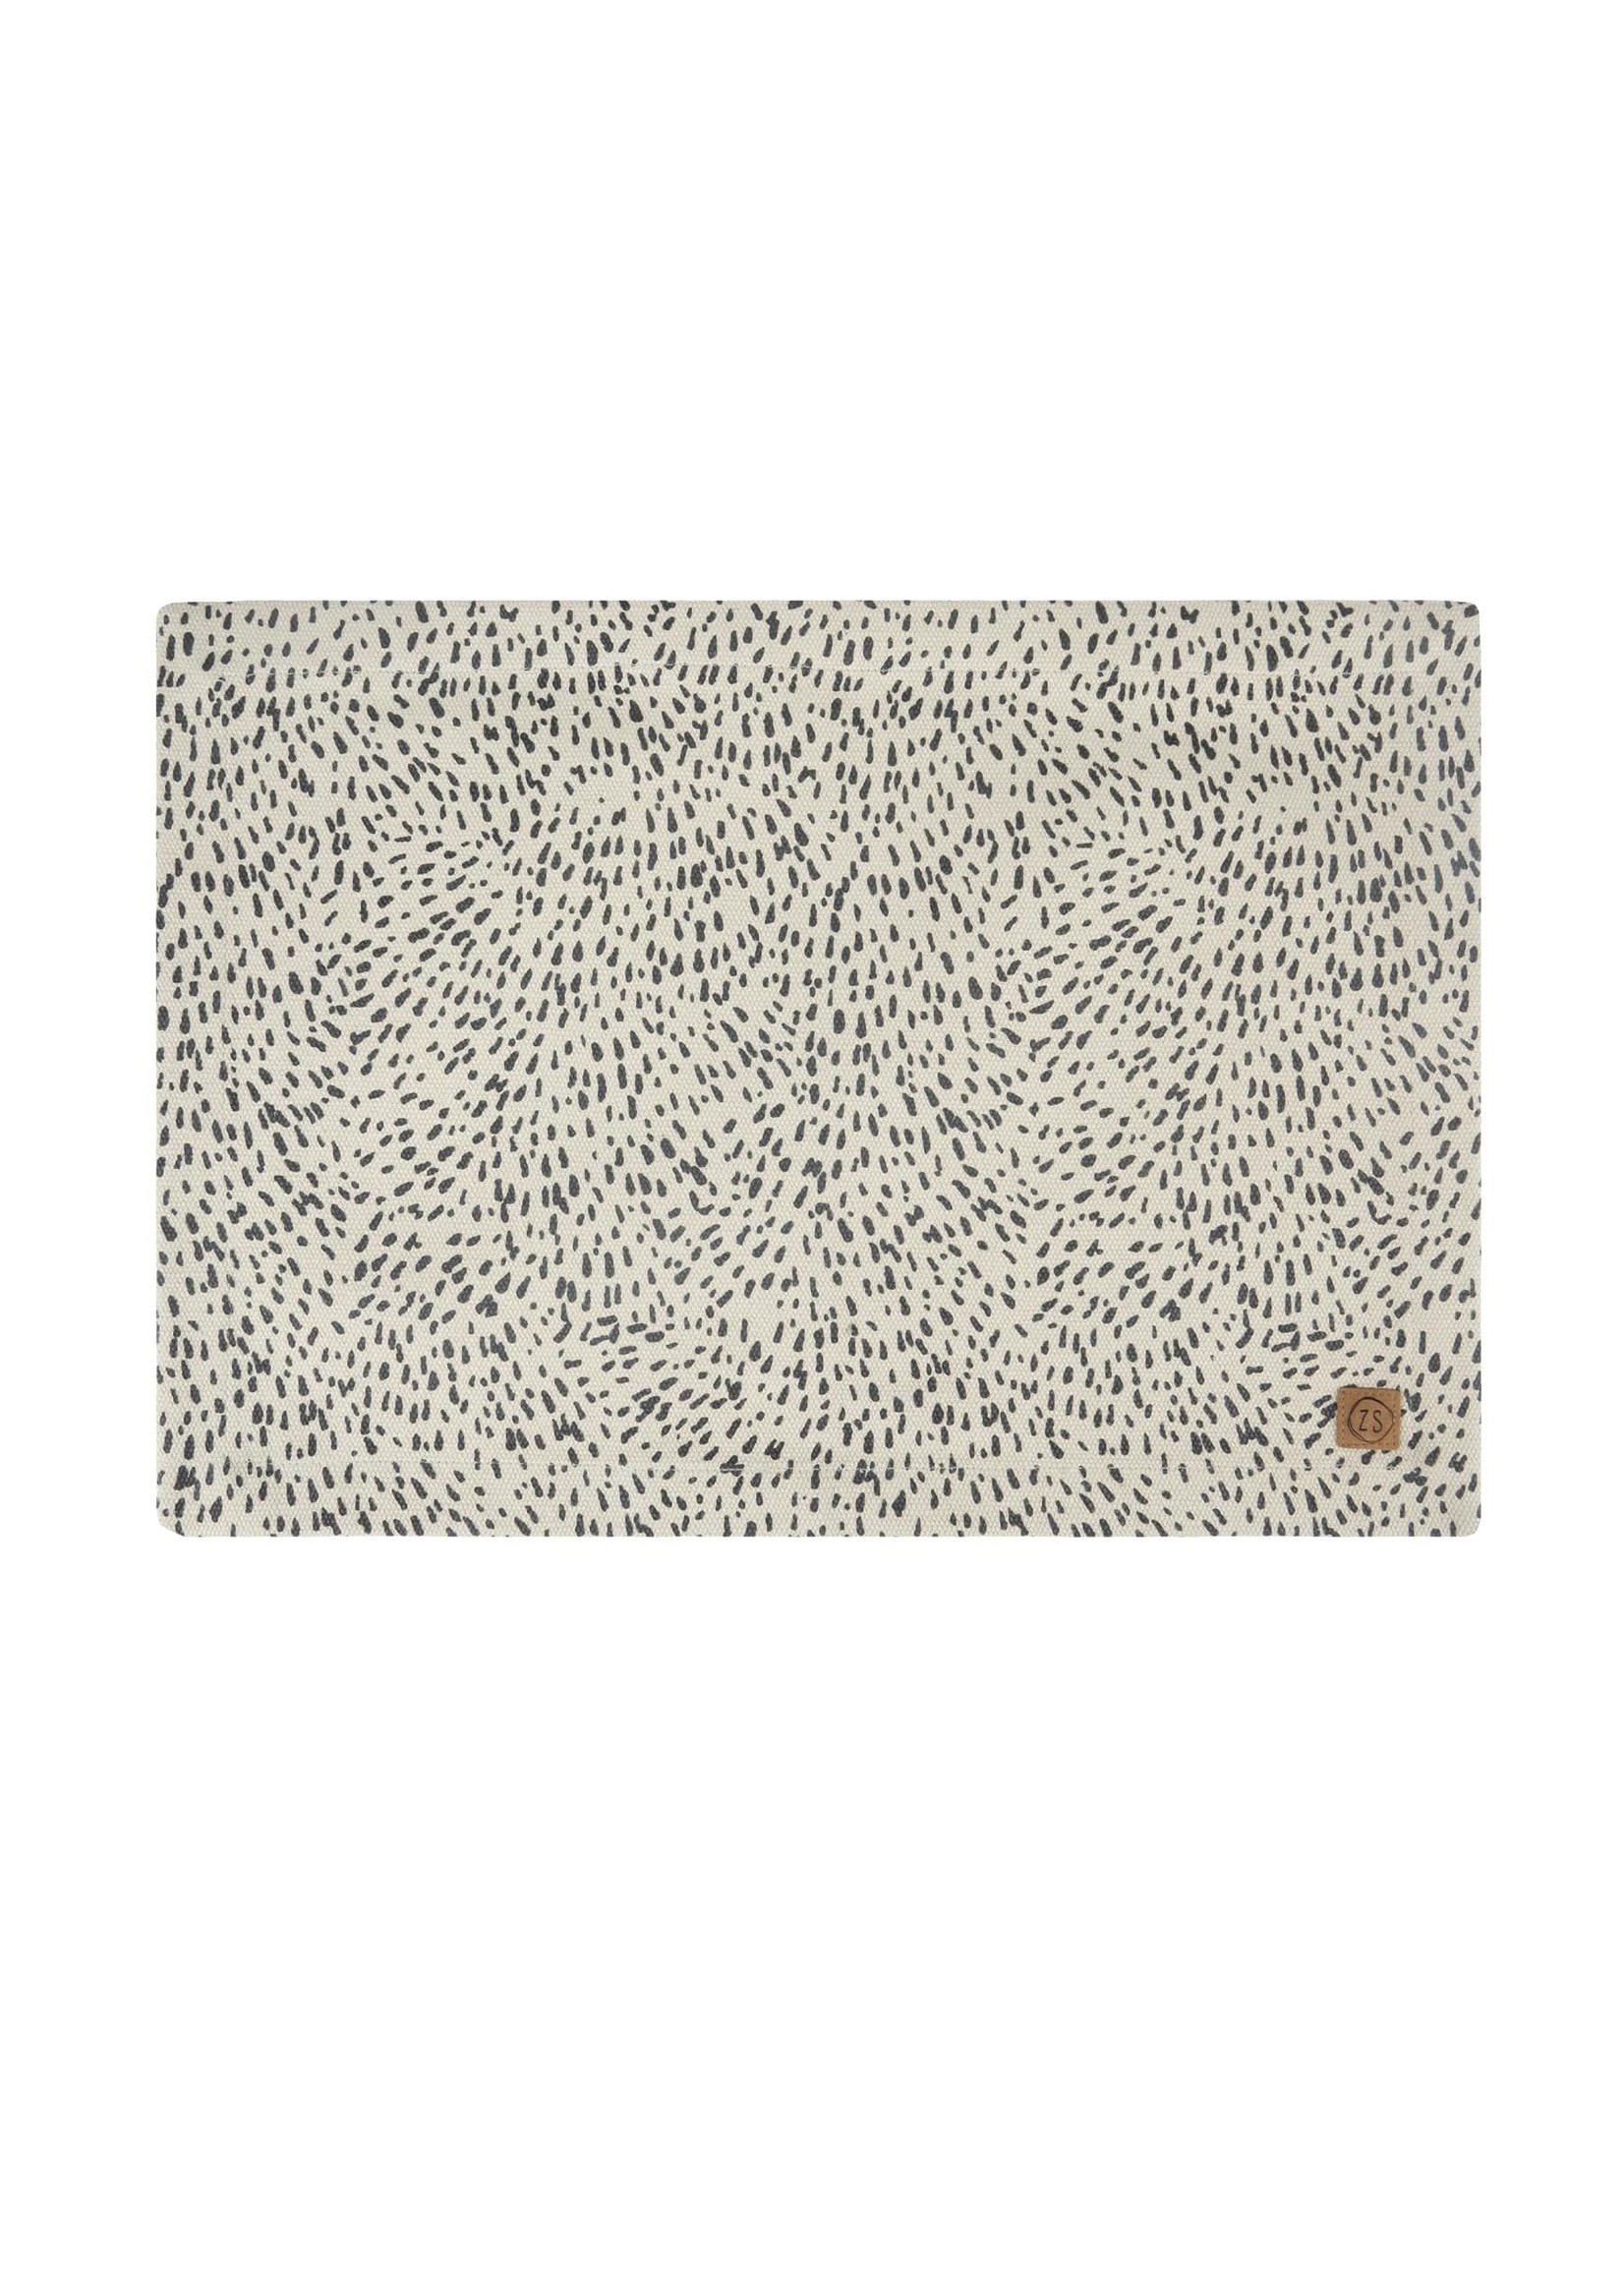 ZUSSS placemat spikkels zand